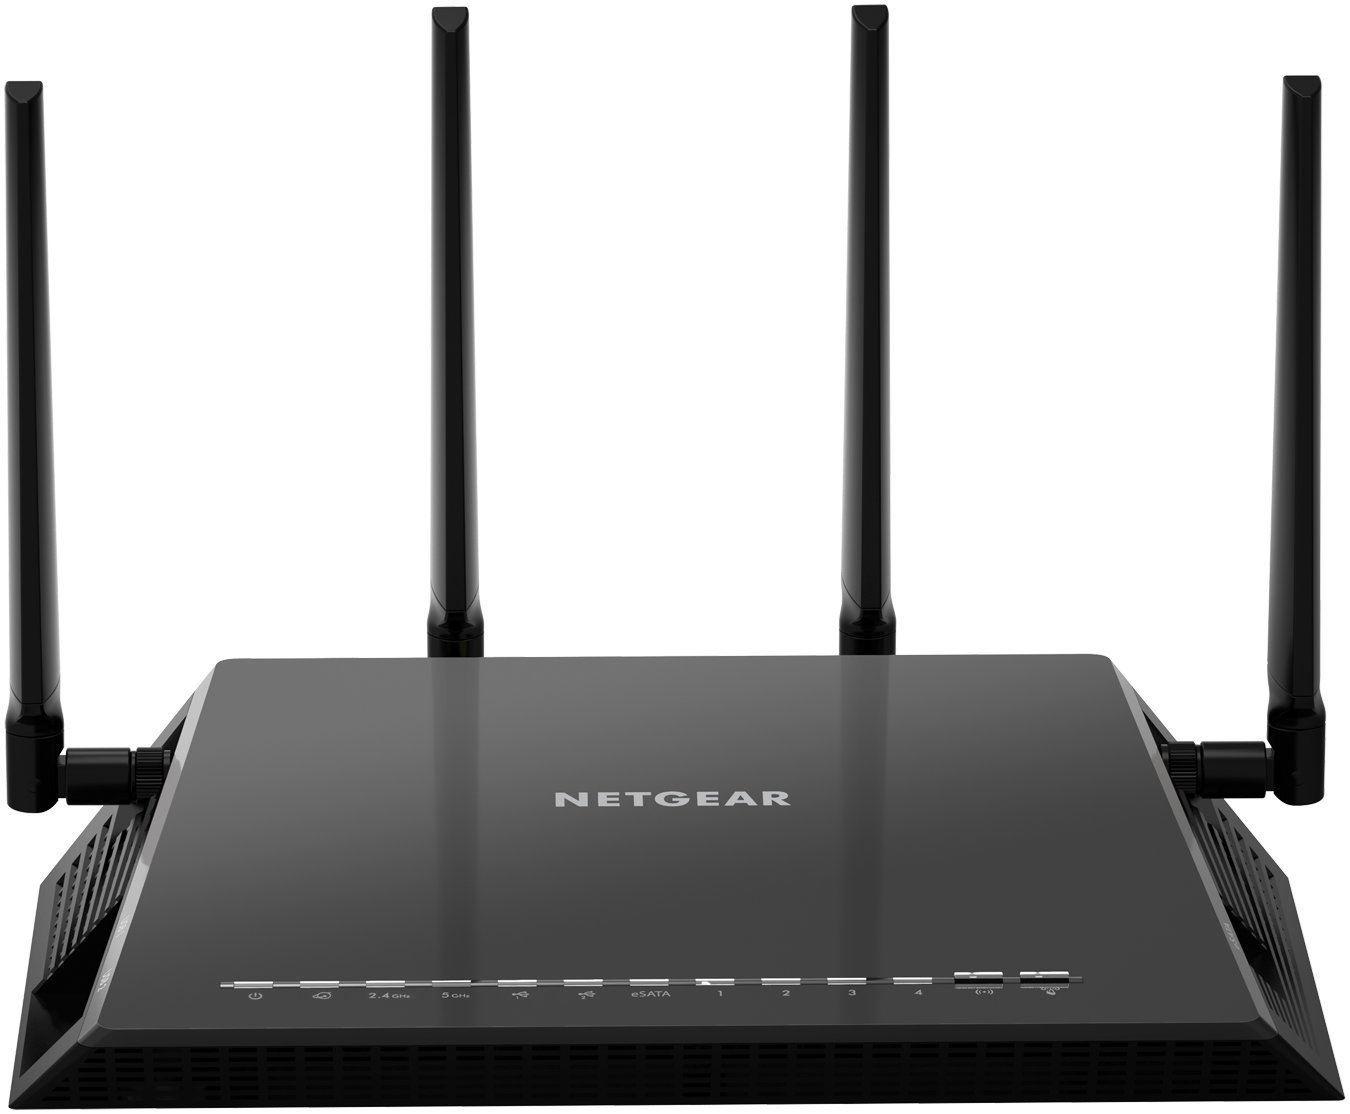 Netgear AC2350 Nighthawk X4 Smart WiFi Router (R7500) Image